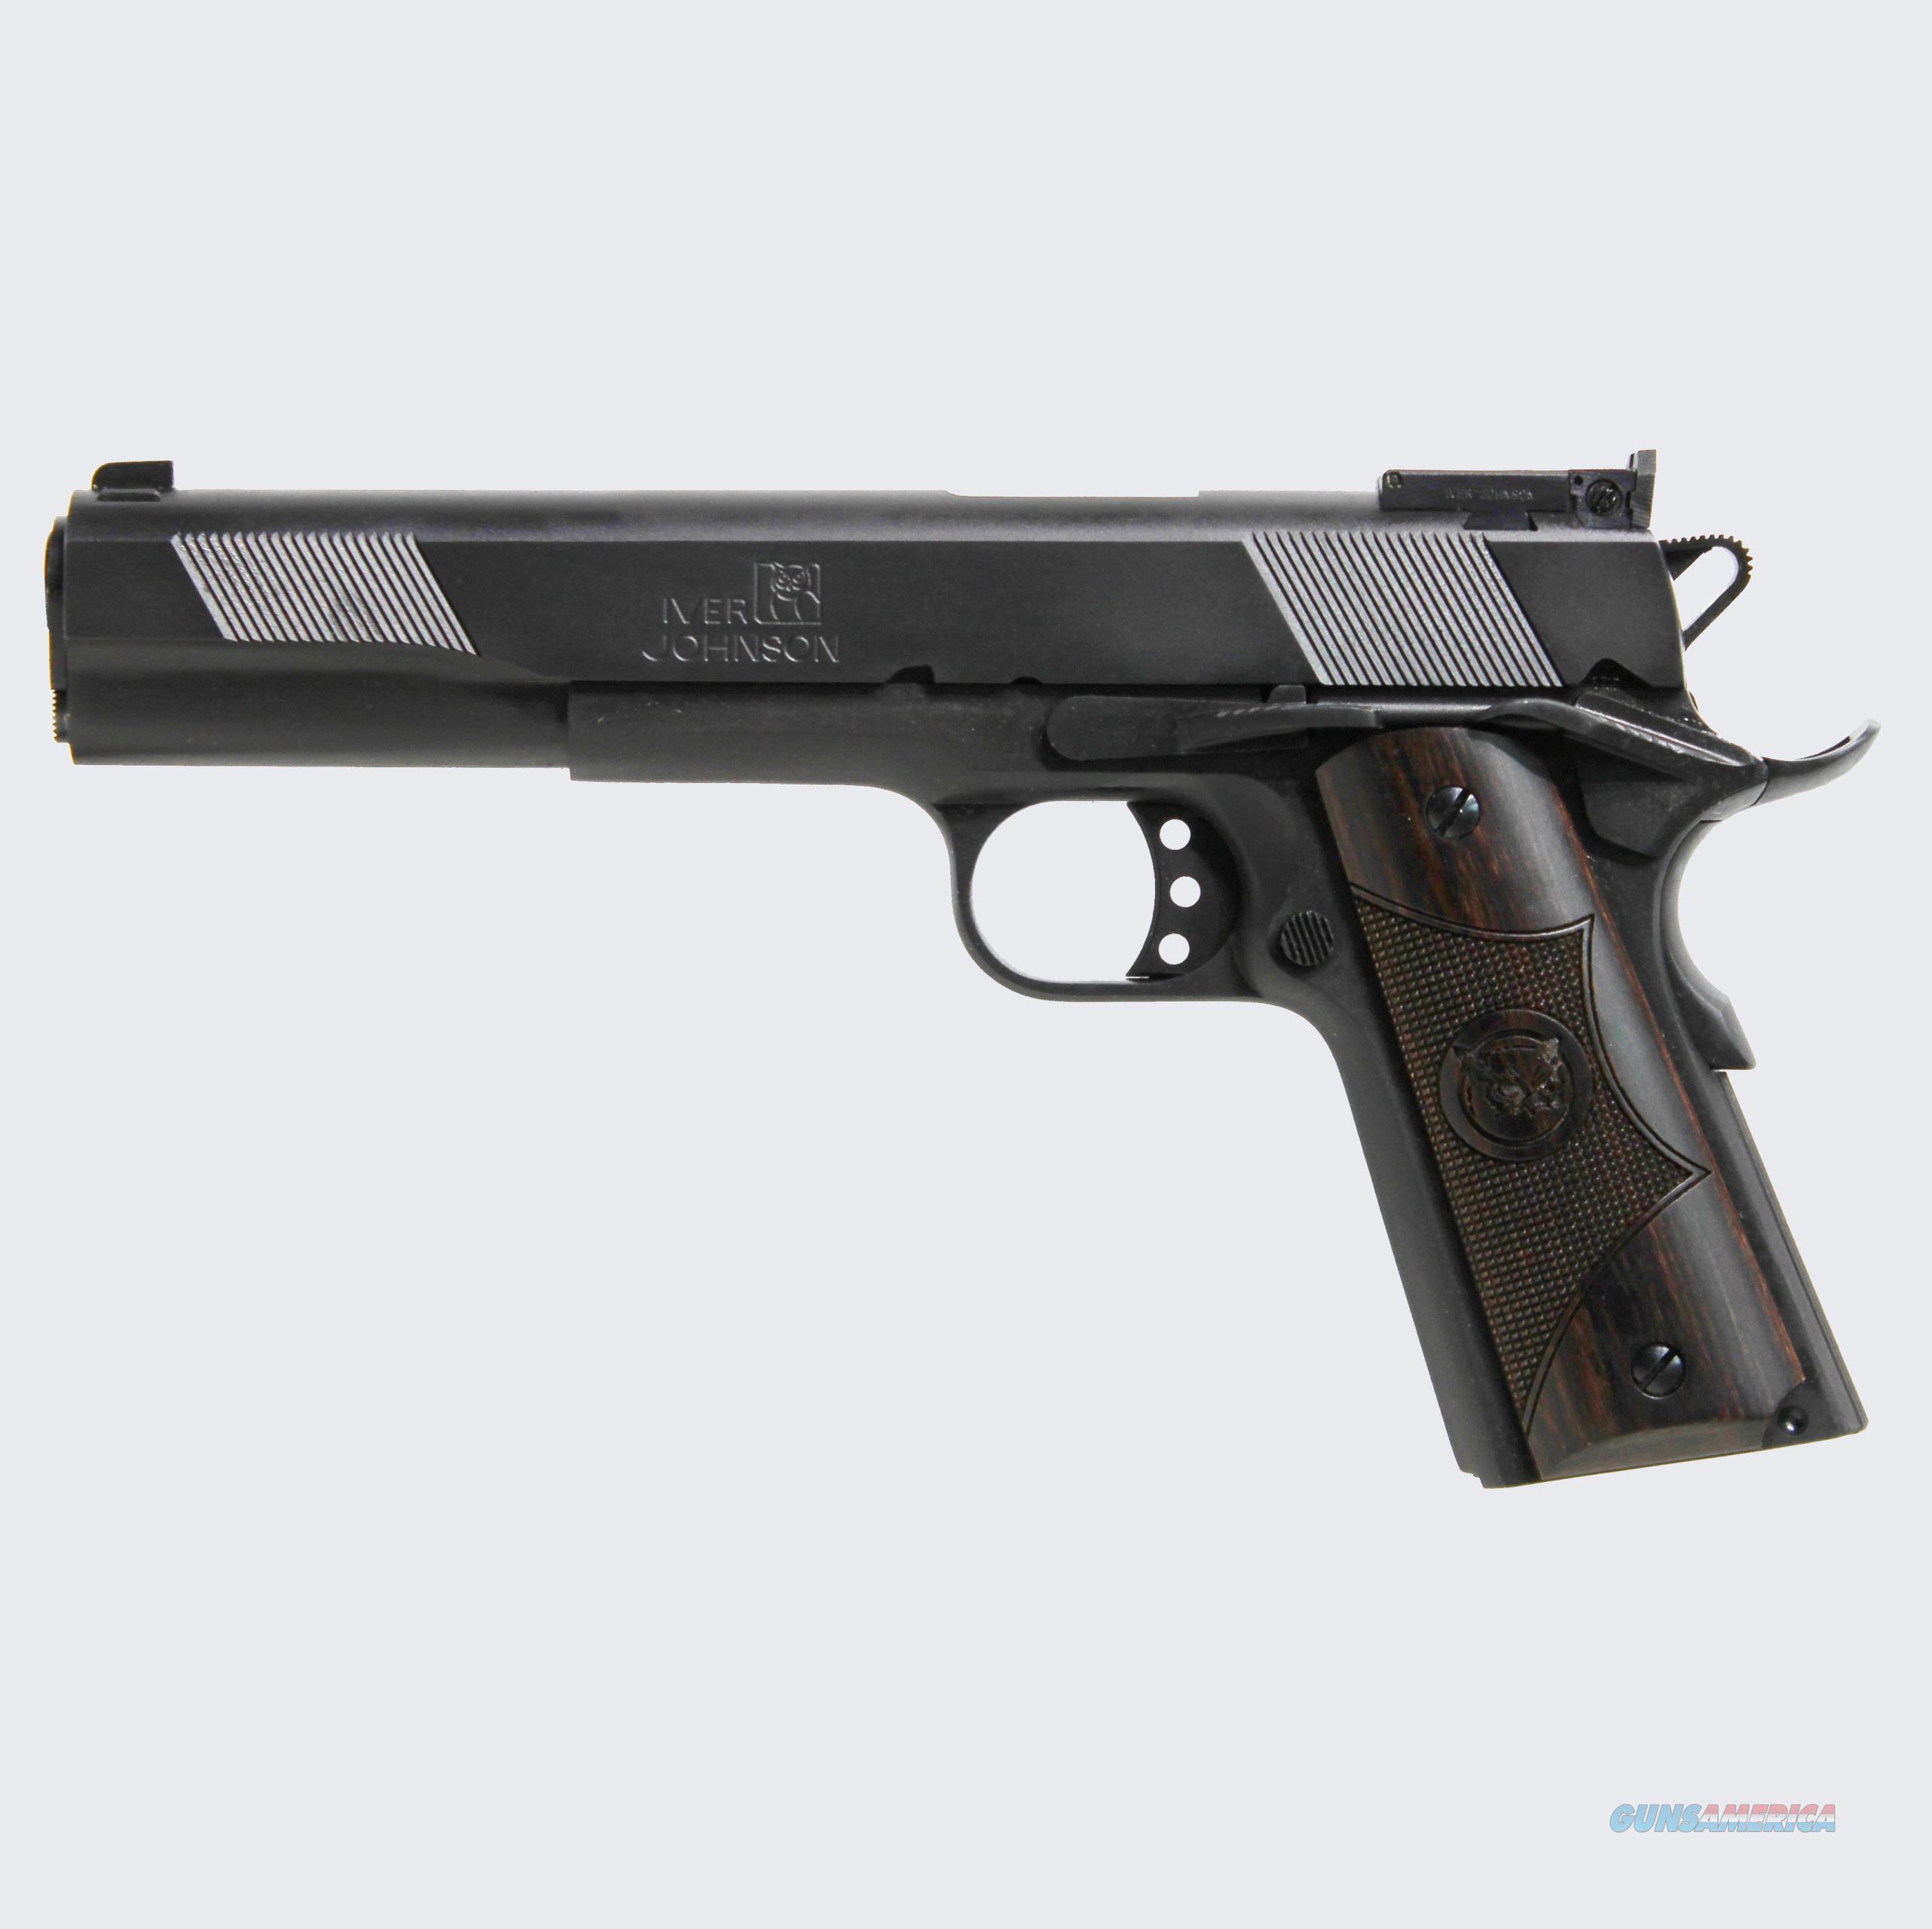 "Iver Johnson Eagle XL-10 10mm 6"" 8 Rds EAGLEXL-10   Guns > Pistols > Iver Johnson Pistols"